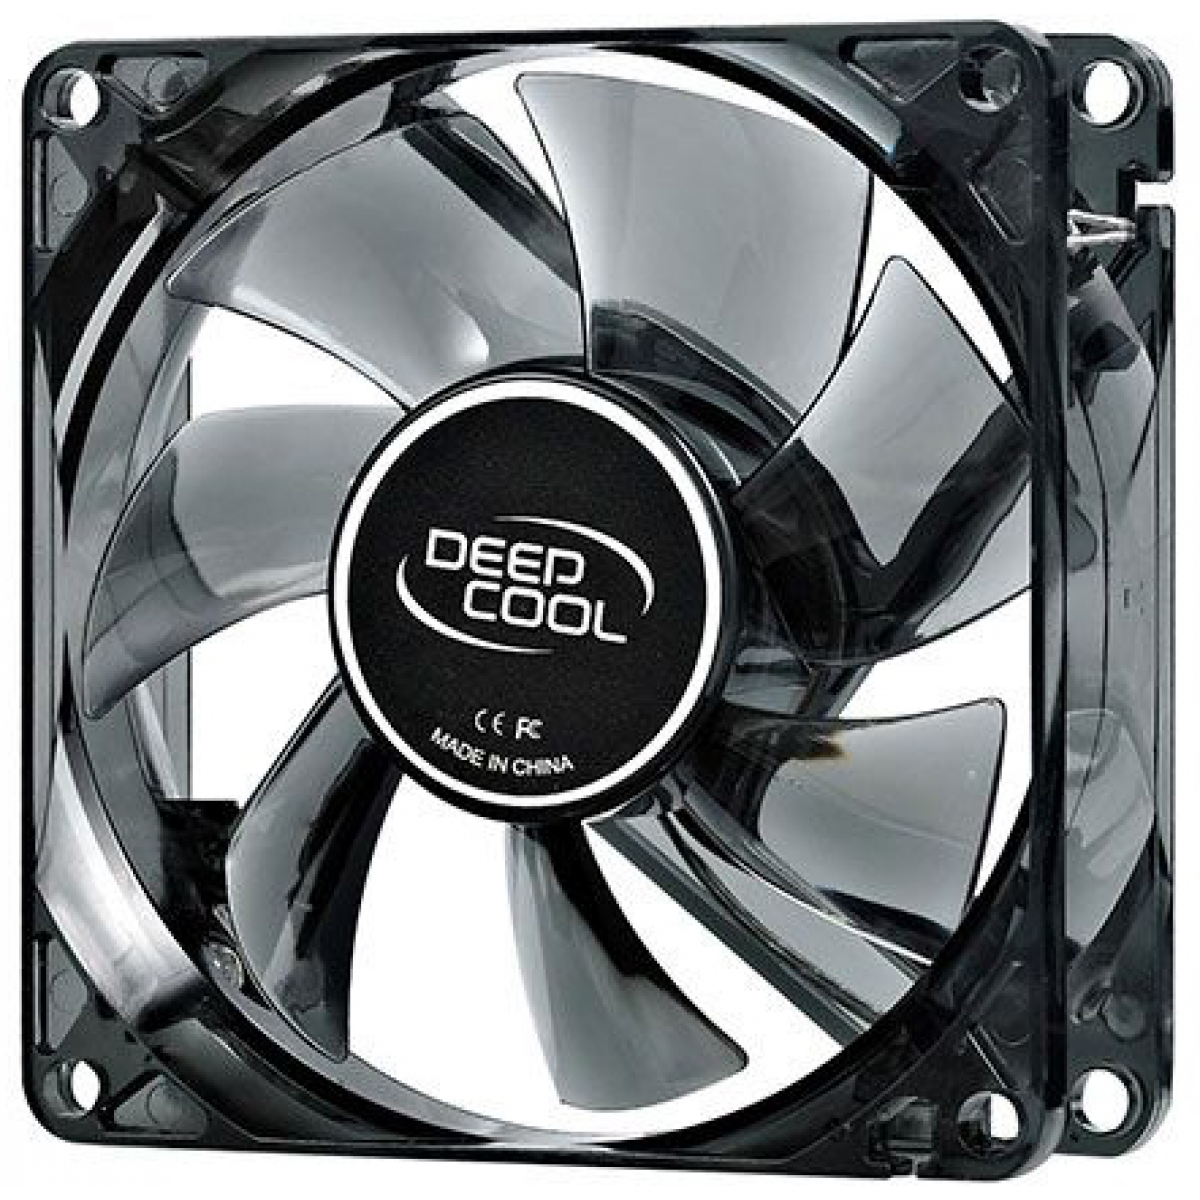 Cooler para Gabinete Deepcool Wind Blade 80, LED Vermelho 80mm, DP-FLED-WB80-RD